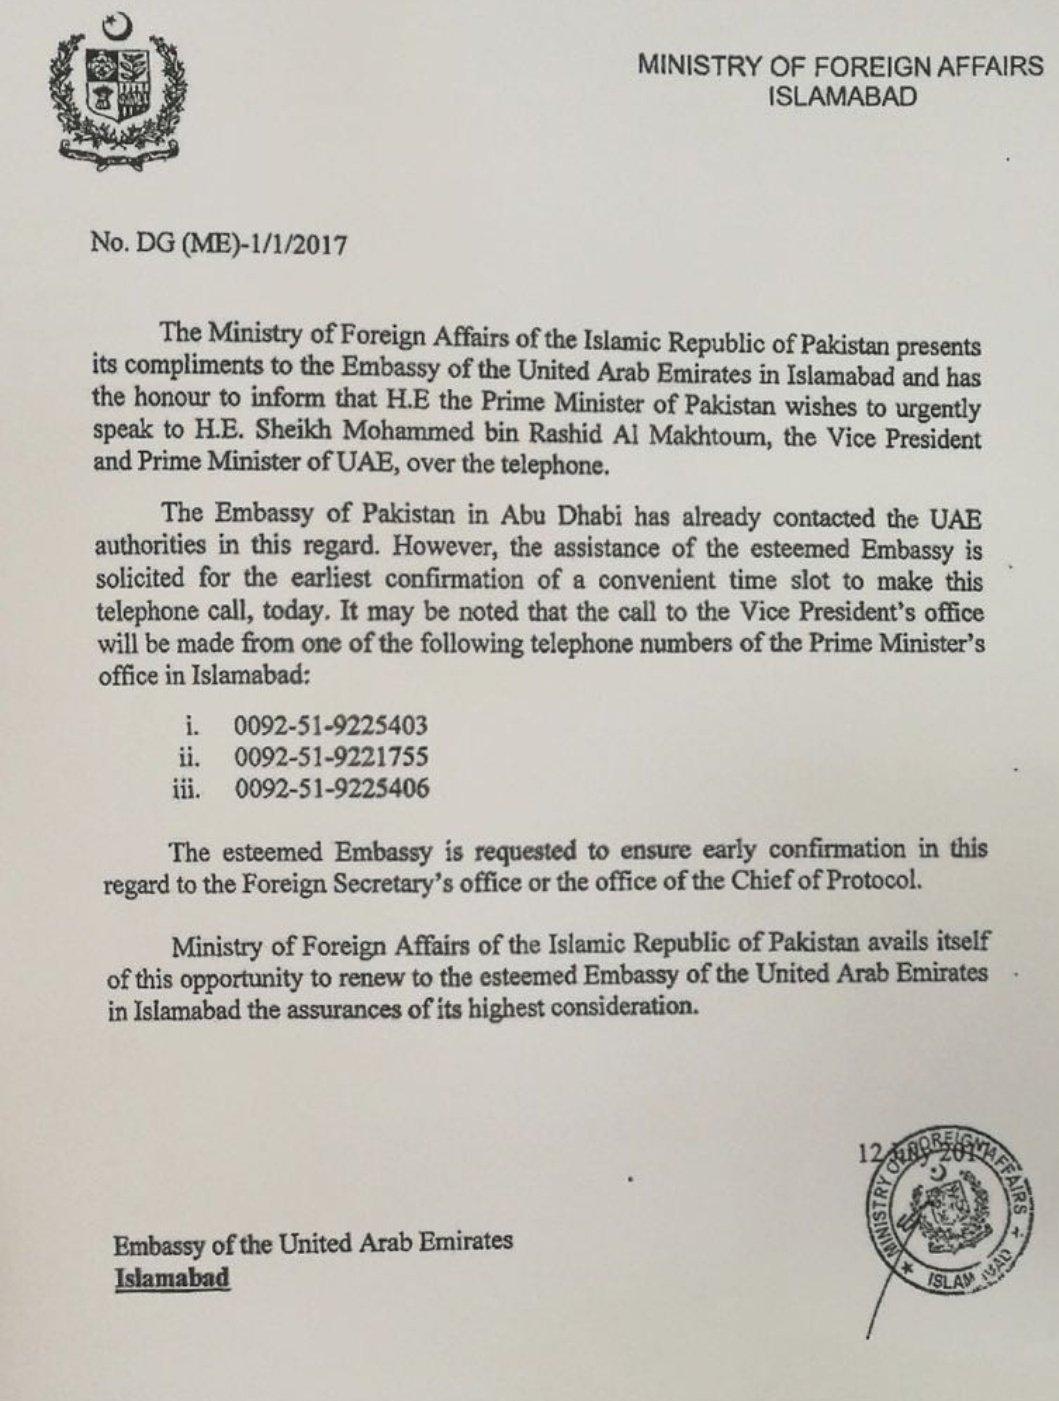 Pakistan Foreign Office letter to the United Arab Emirates (UAE) regarding Prime Minister Nawaz Sharif wish to contact Sheikh Mohammed bin Rashid Al Makhtoum   pakistantribe.com